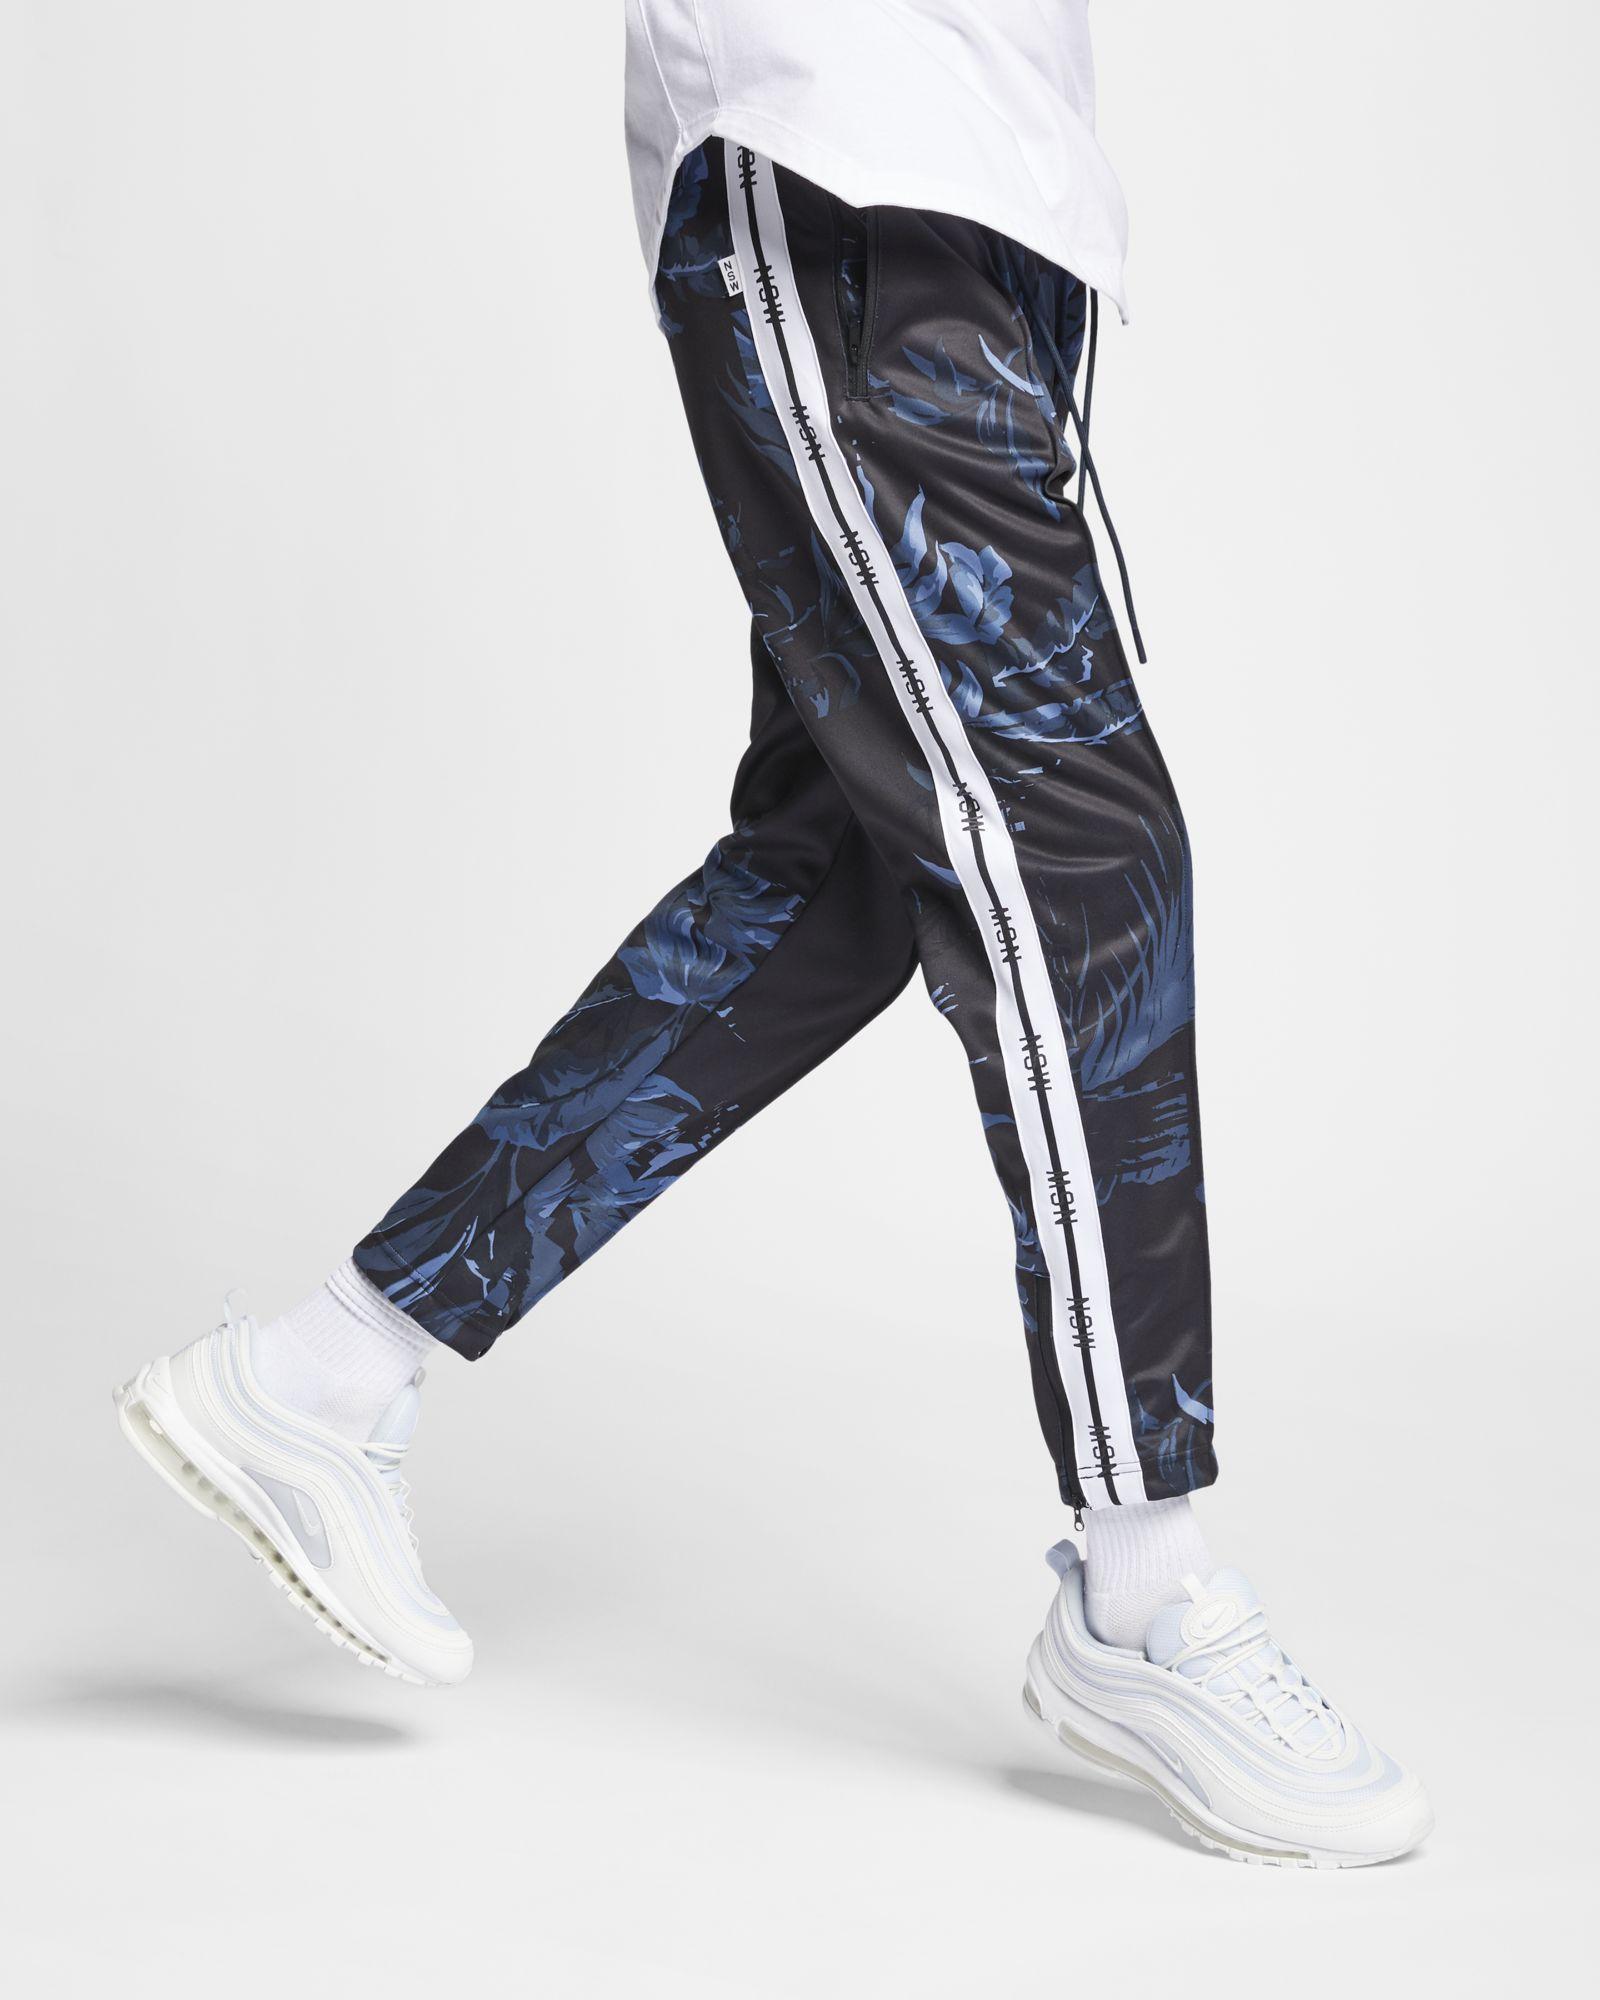 939b0a2db5f Nike Sportswear NSW Tracksuit Pants - SPORTING GOODS Sports Pants -  Superfanas.lt